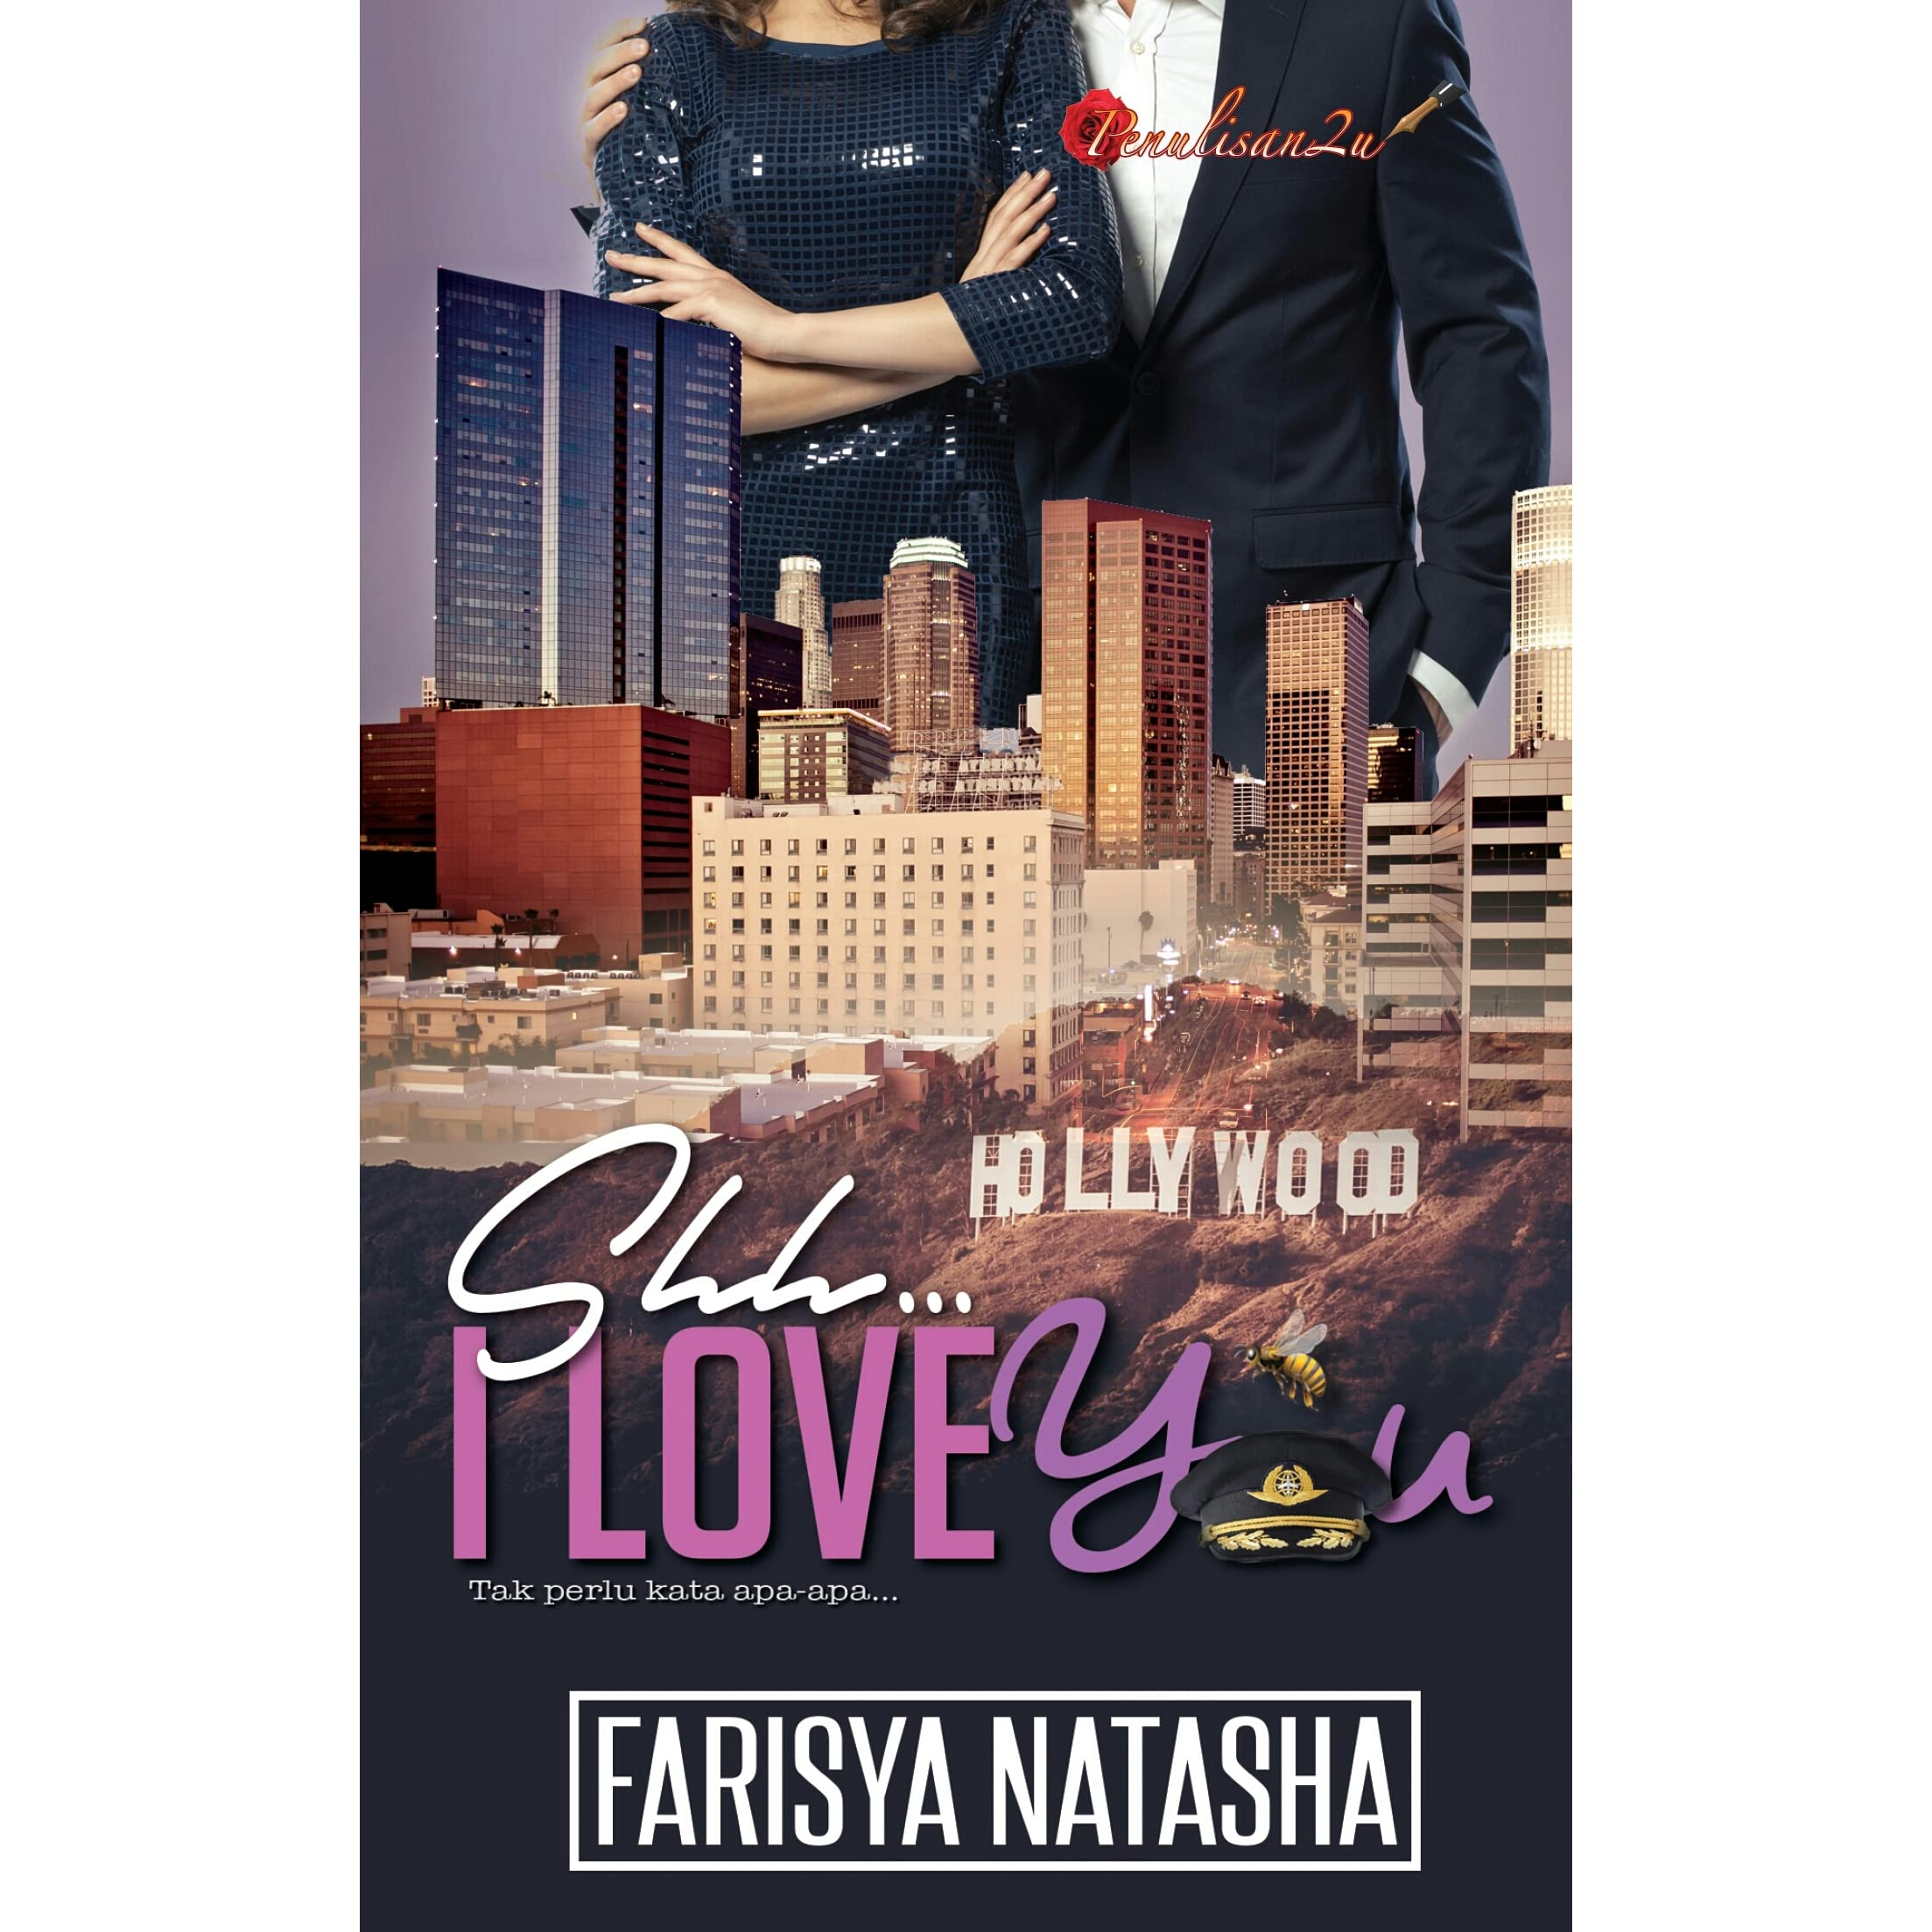 Shhh I Love You By Farisya Natasha